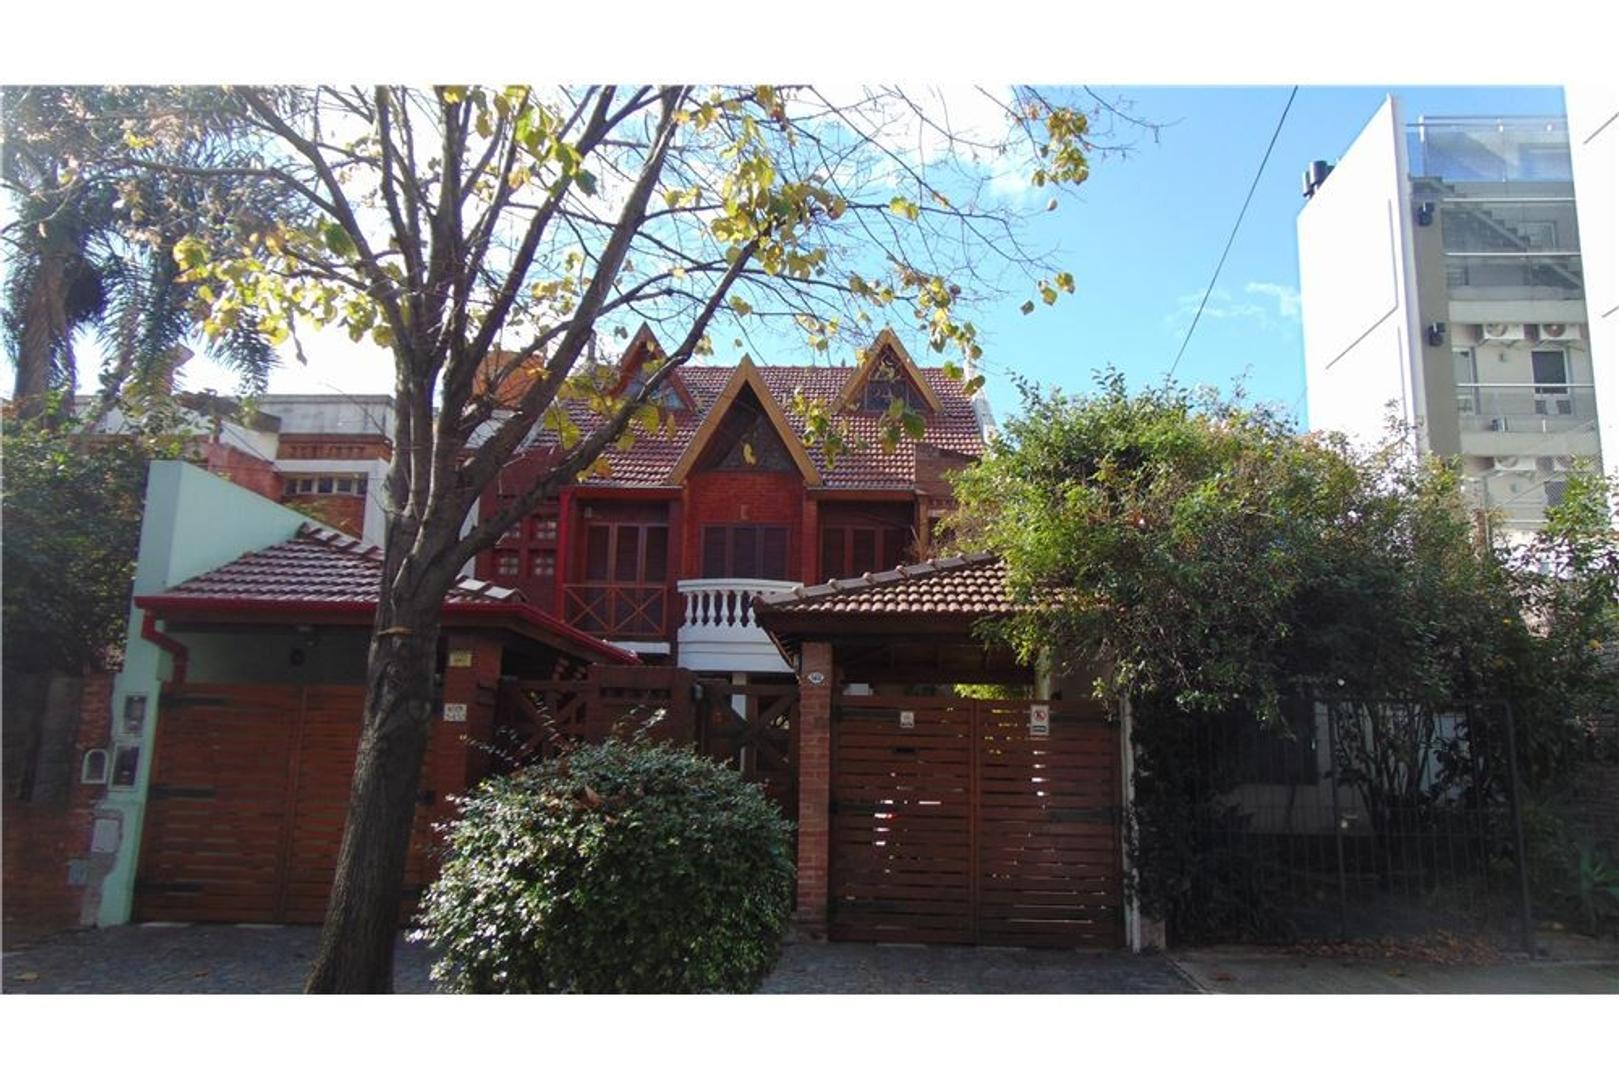 Casa duplex 3 dorm.,garage, jardin, quincho